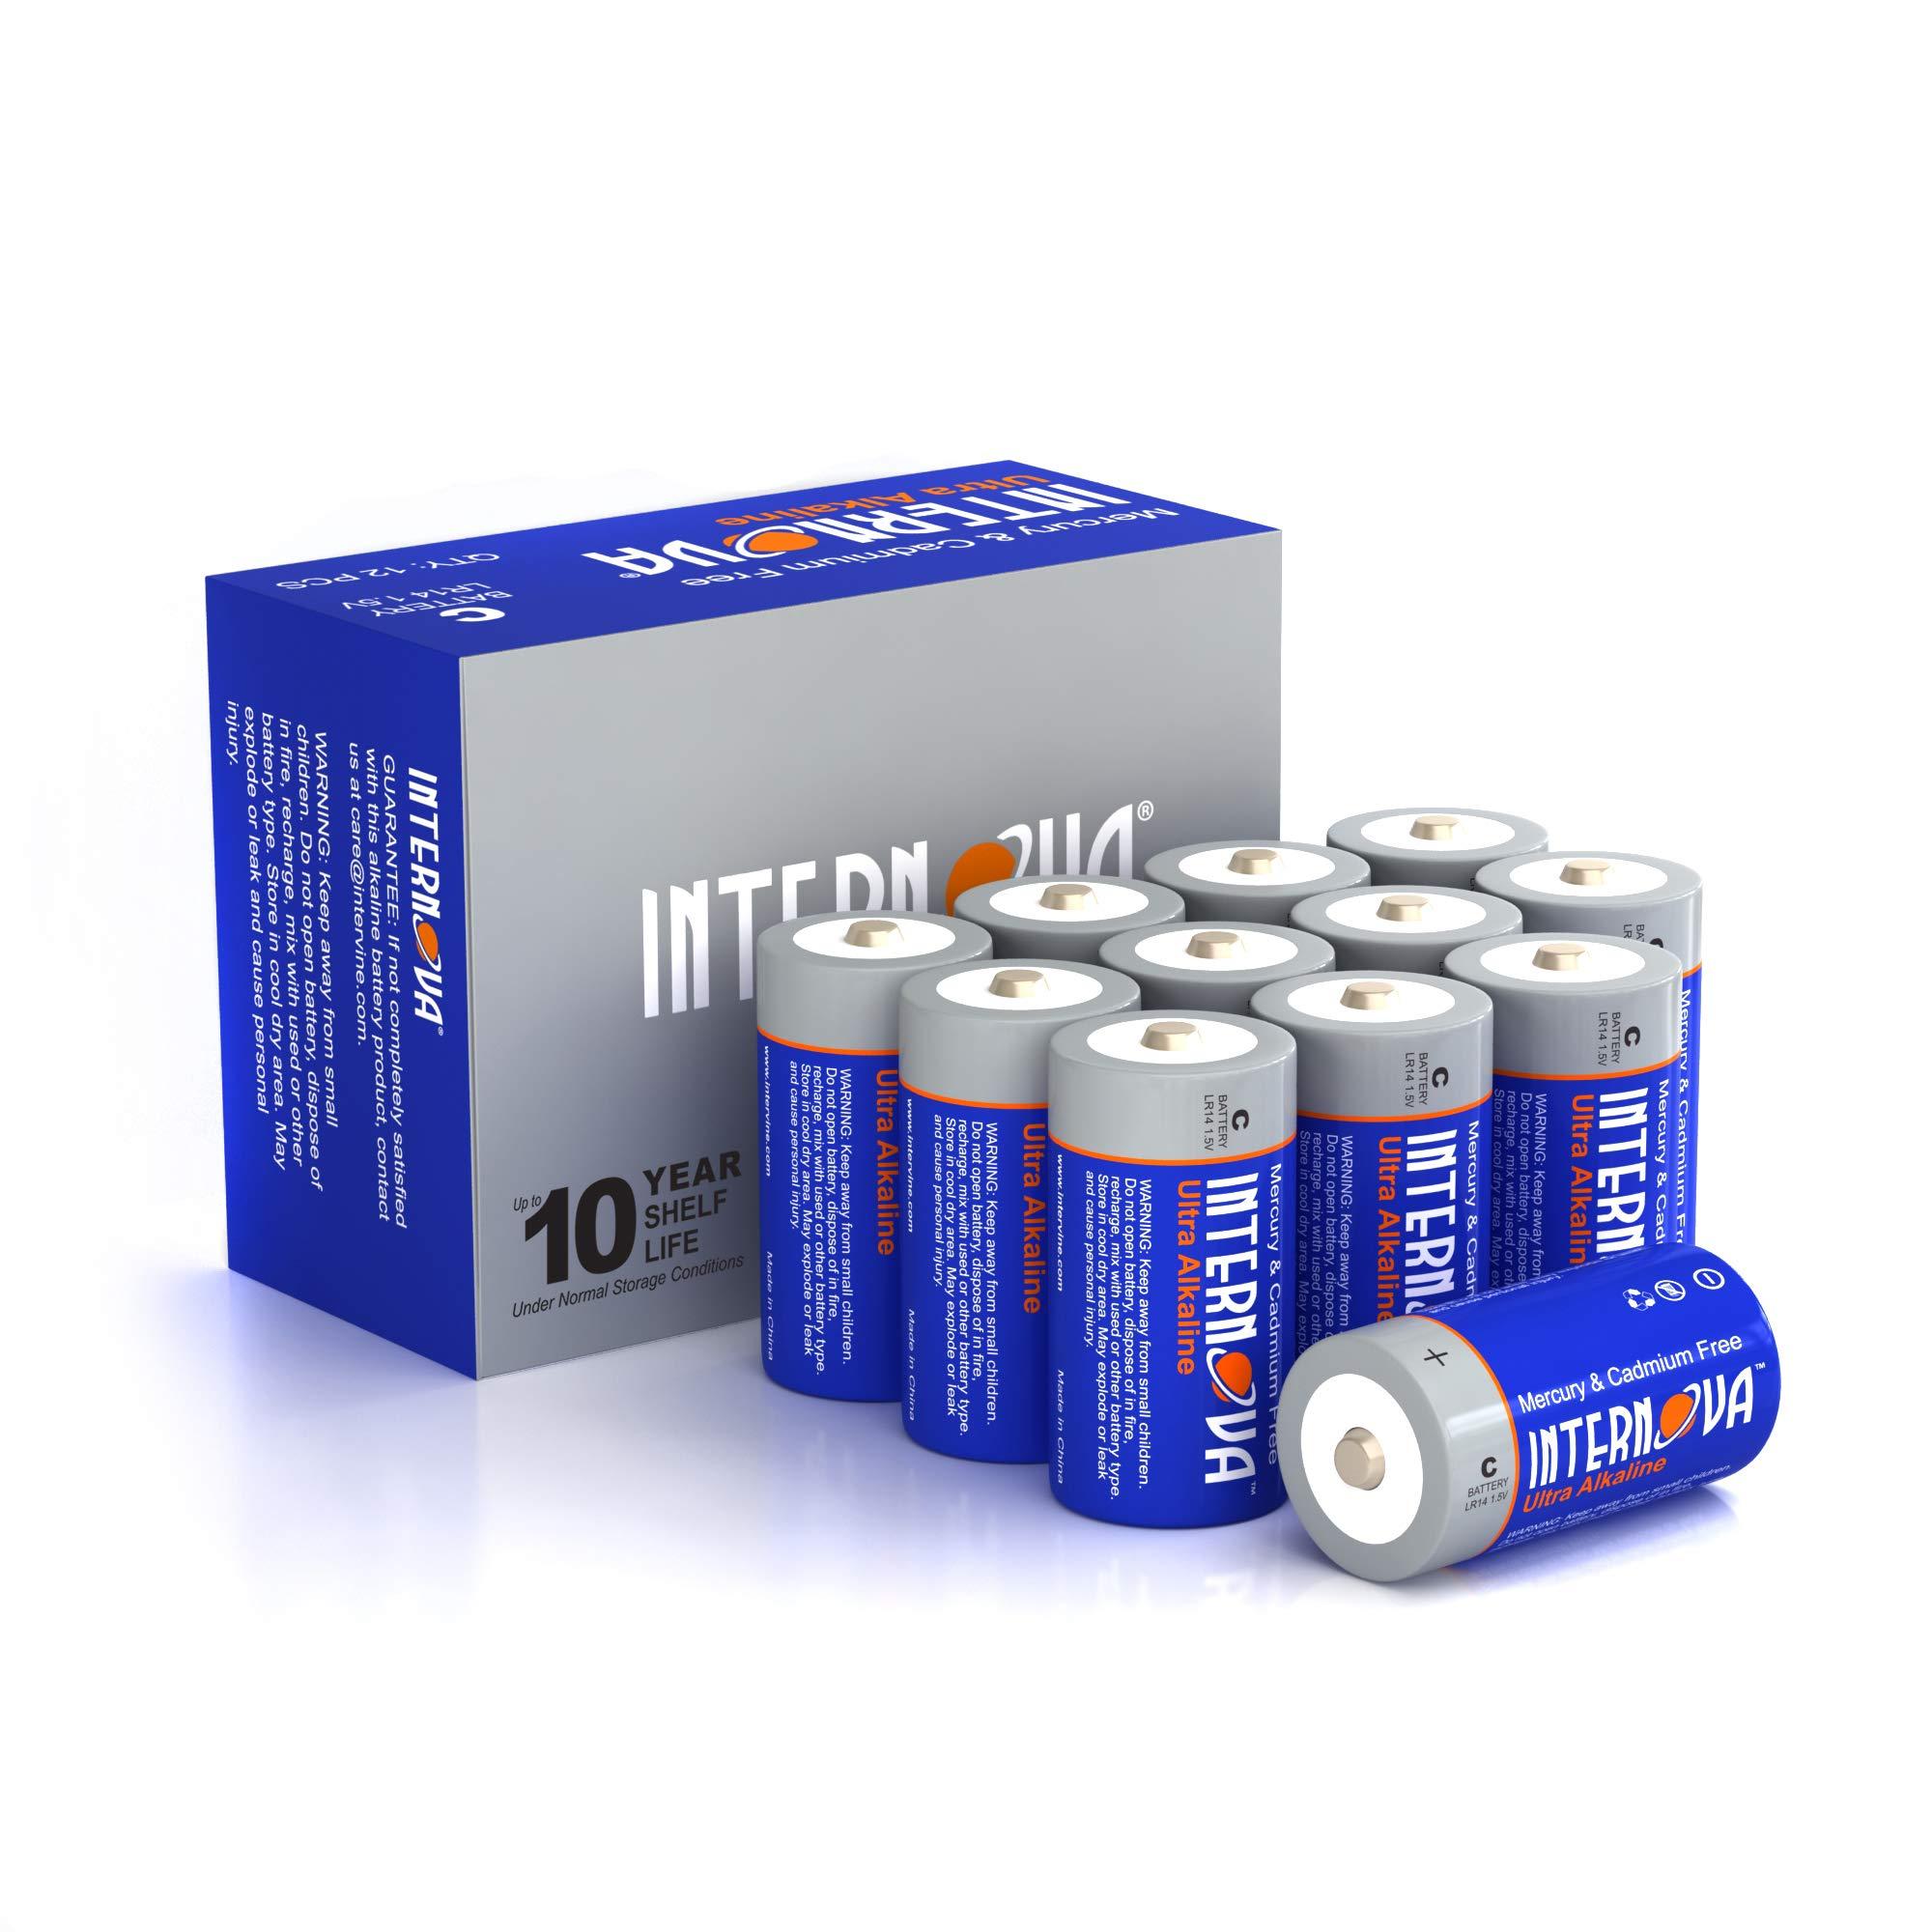 Internova Ultra Alkaline C Batteries, LR14 1.5V Cell High Performance, 12 Pack by Internova